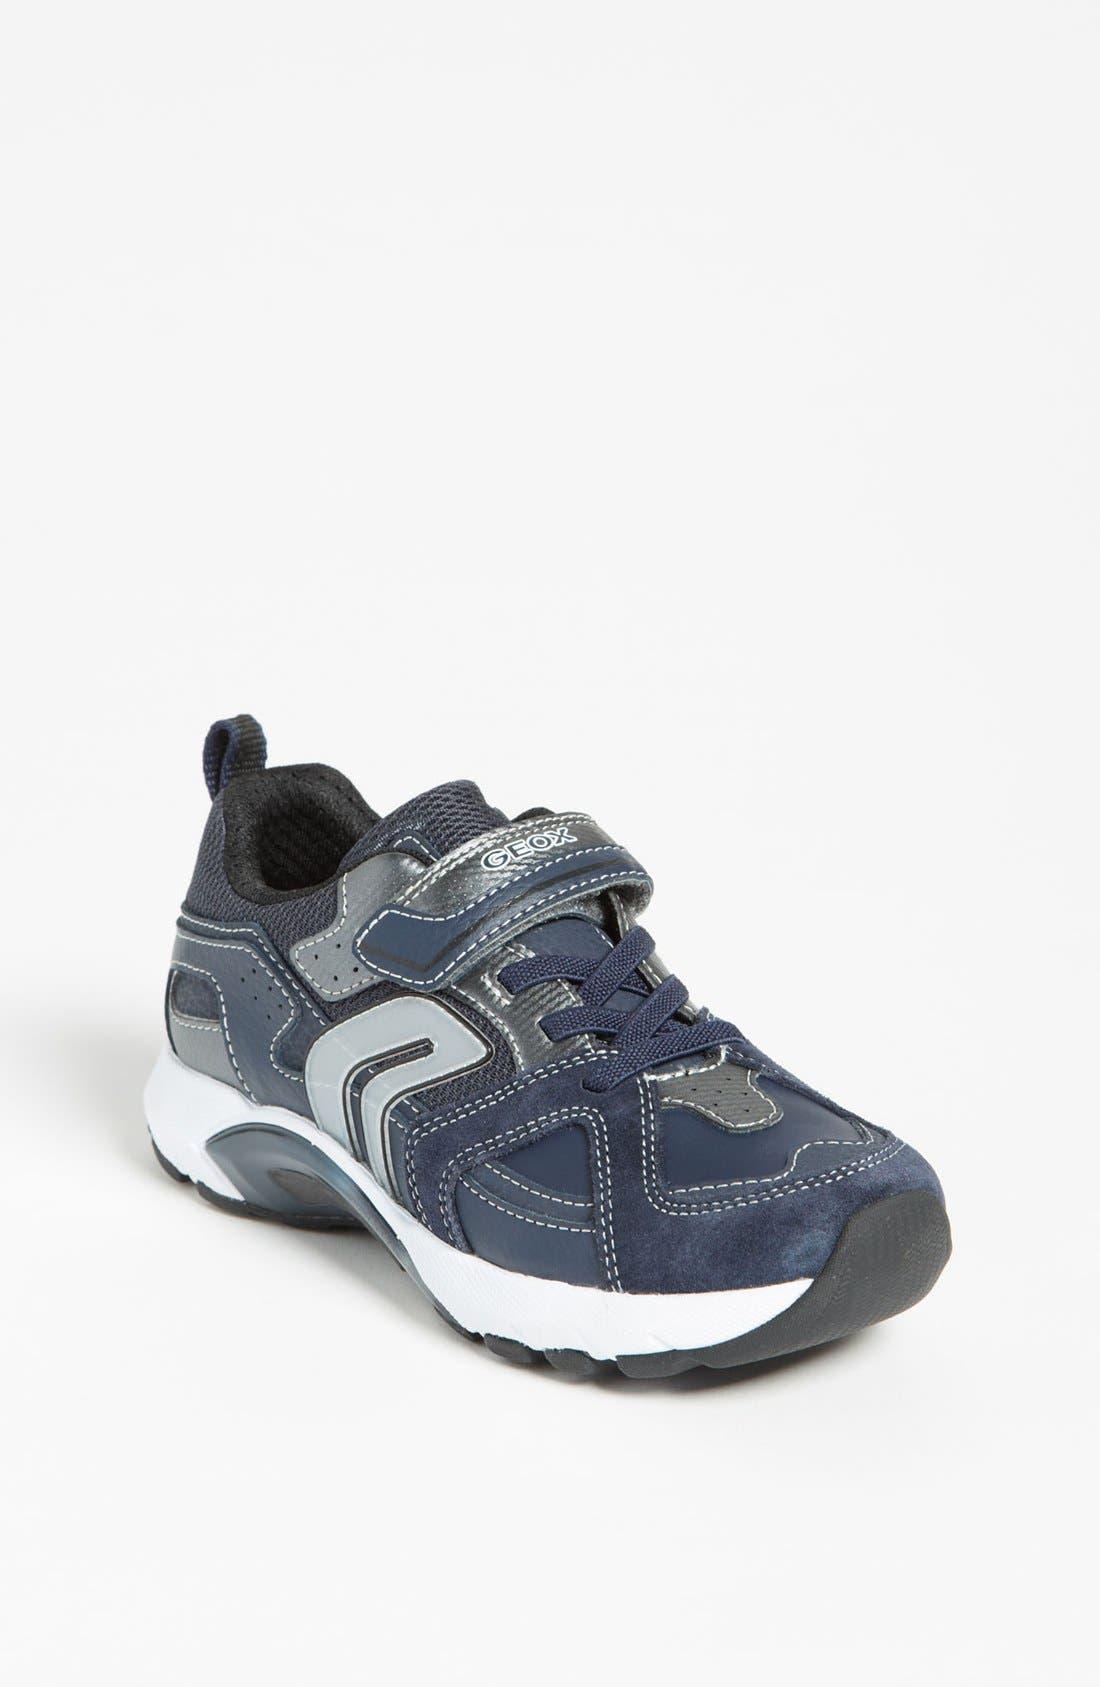 Alternate Image 1 Selected - Geox 'Stark 8' Sneaker (Toddler, Little Kid & Big Kid)